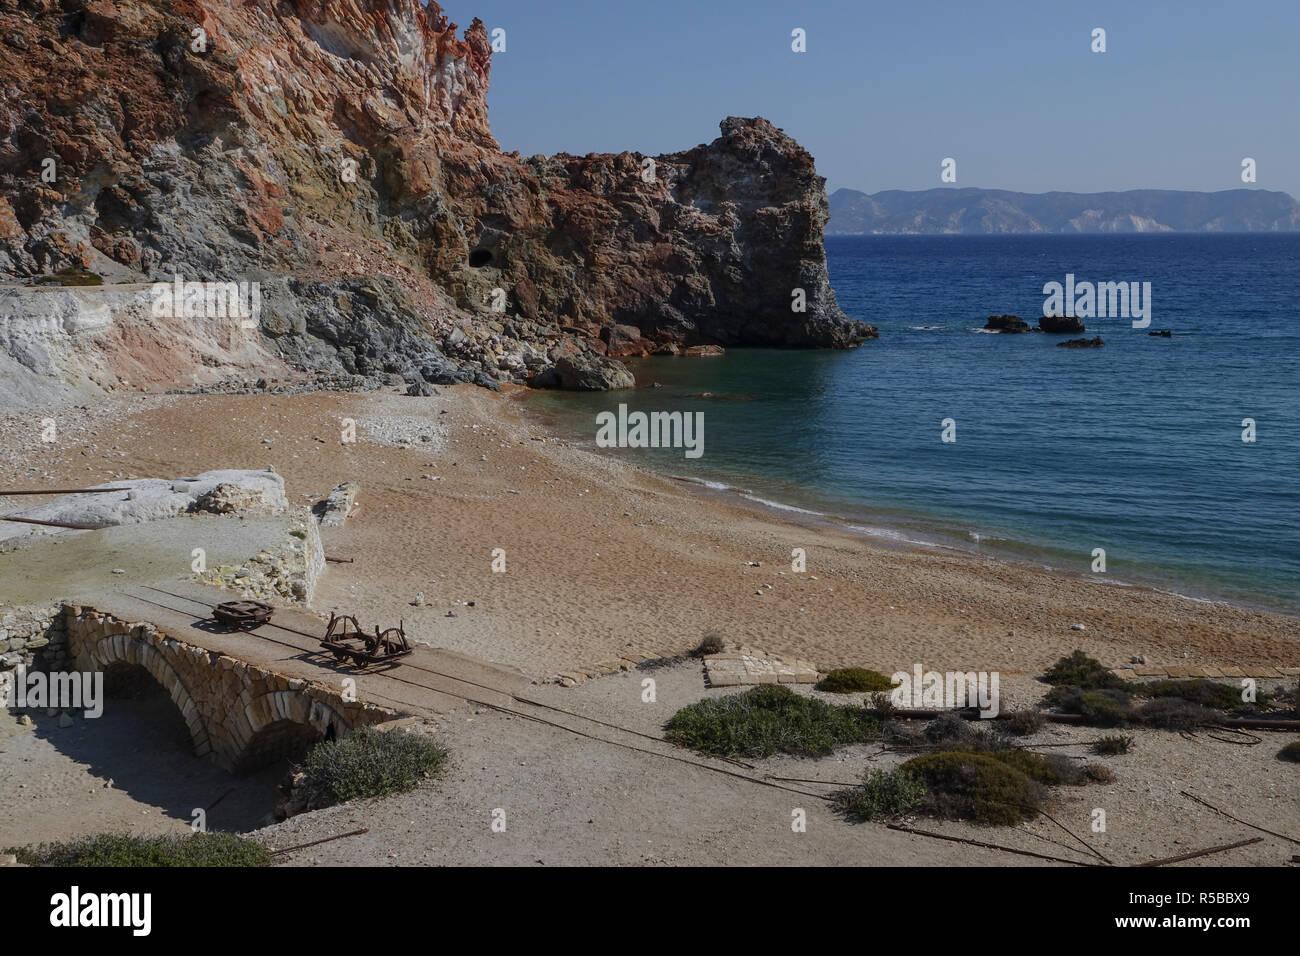 Paliorema sulfur mine and processing facility, Milos Island, Greece - Stock Image